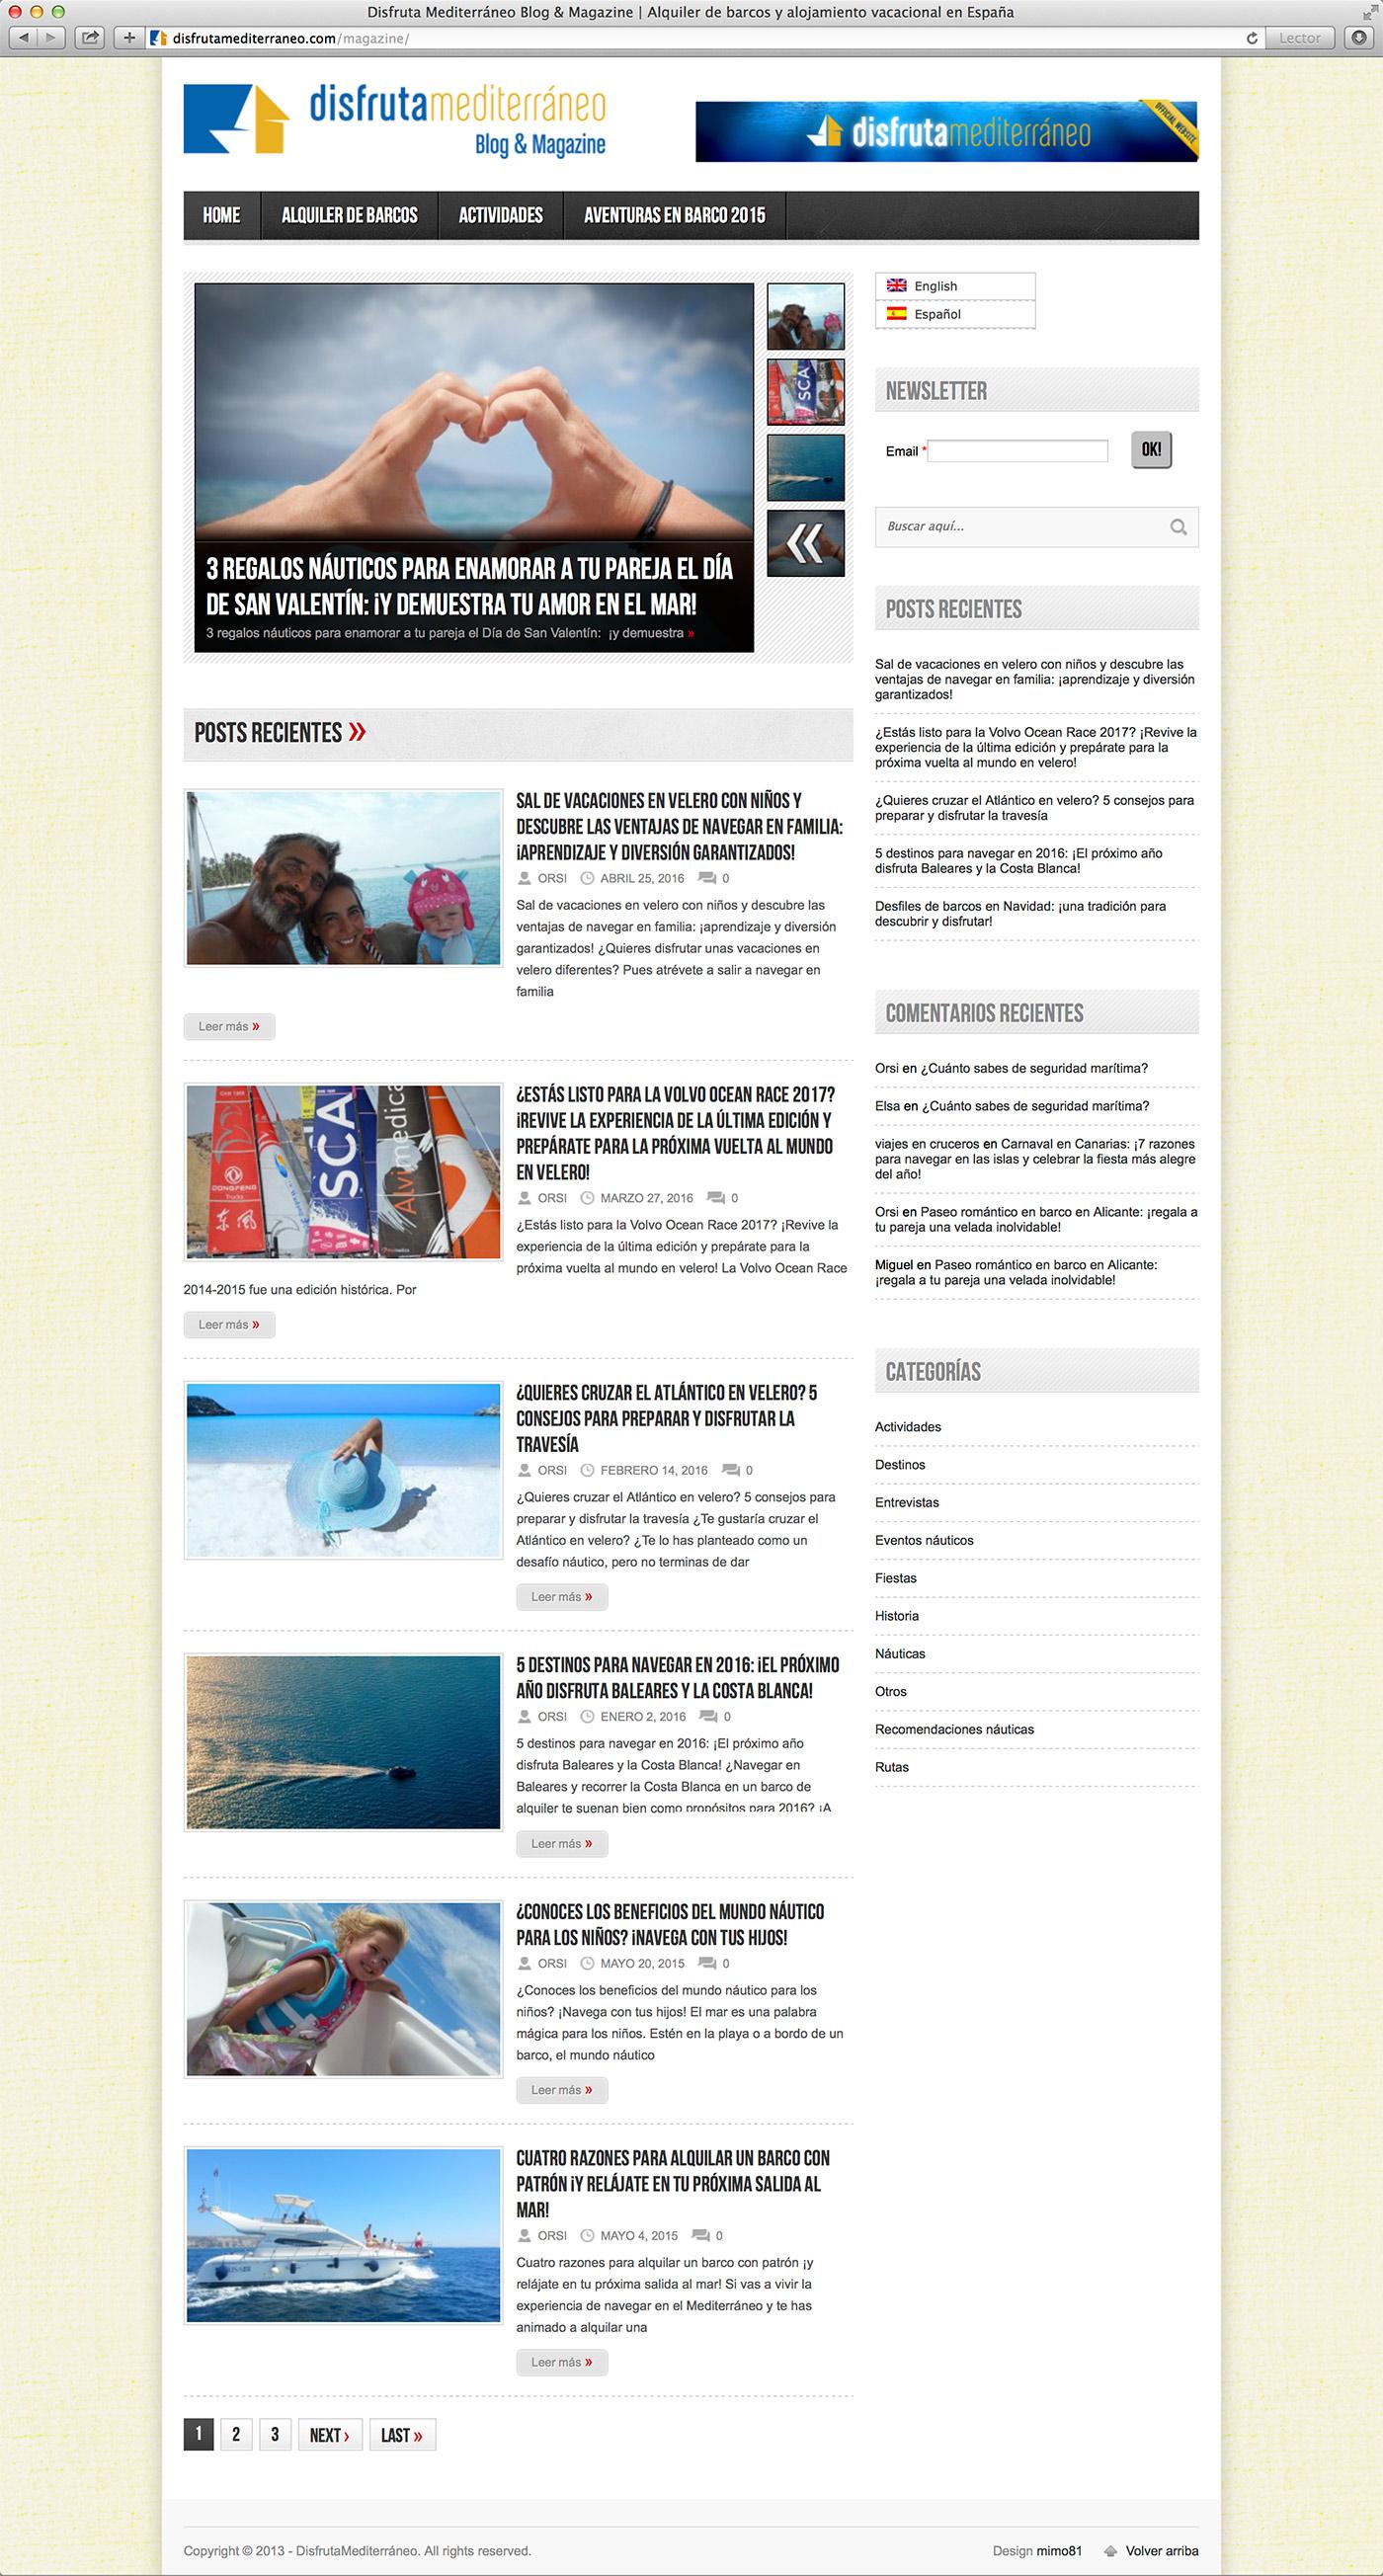 2013.01.web_disfrutamediterraneo.blog